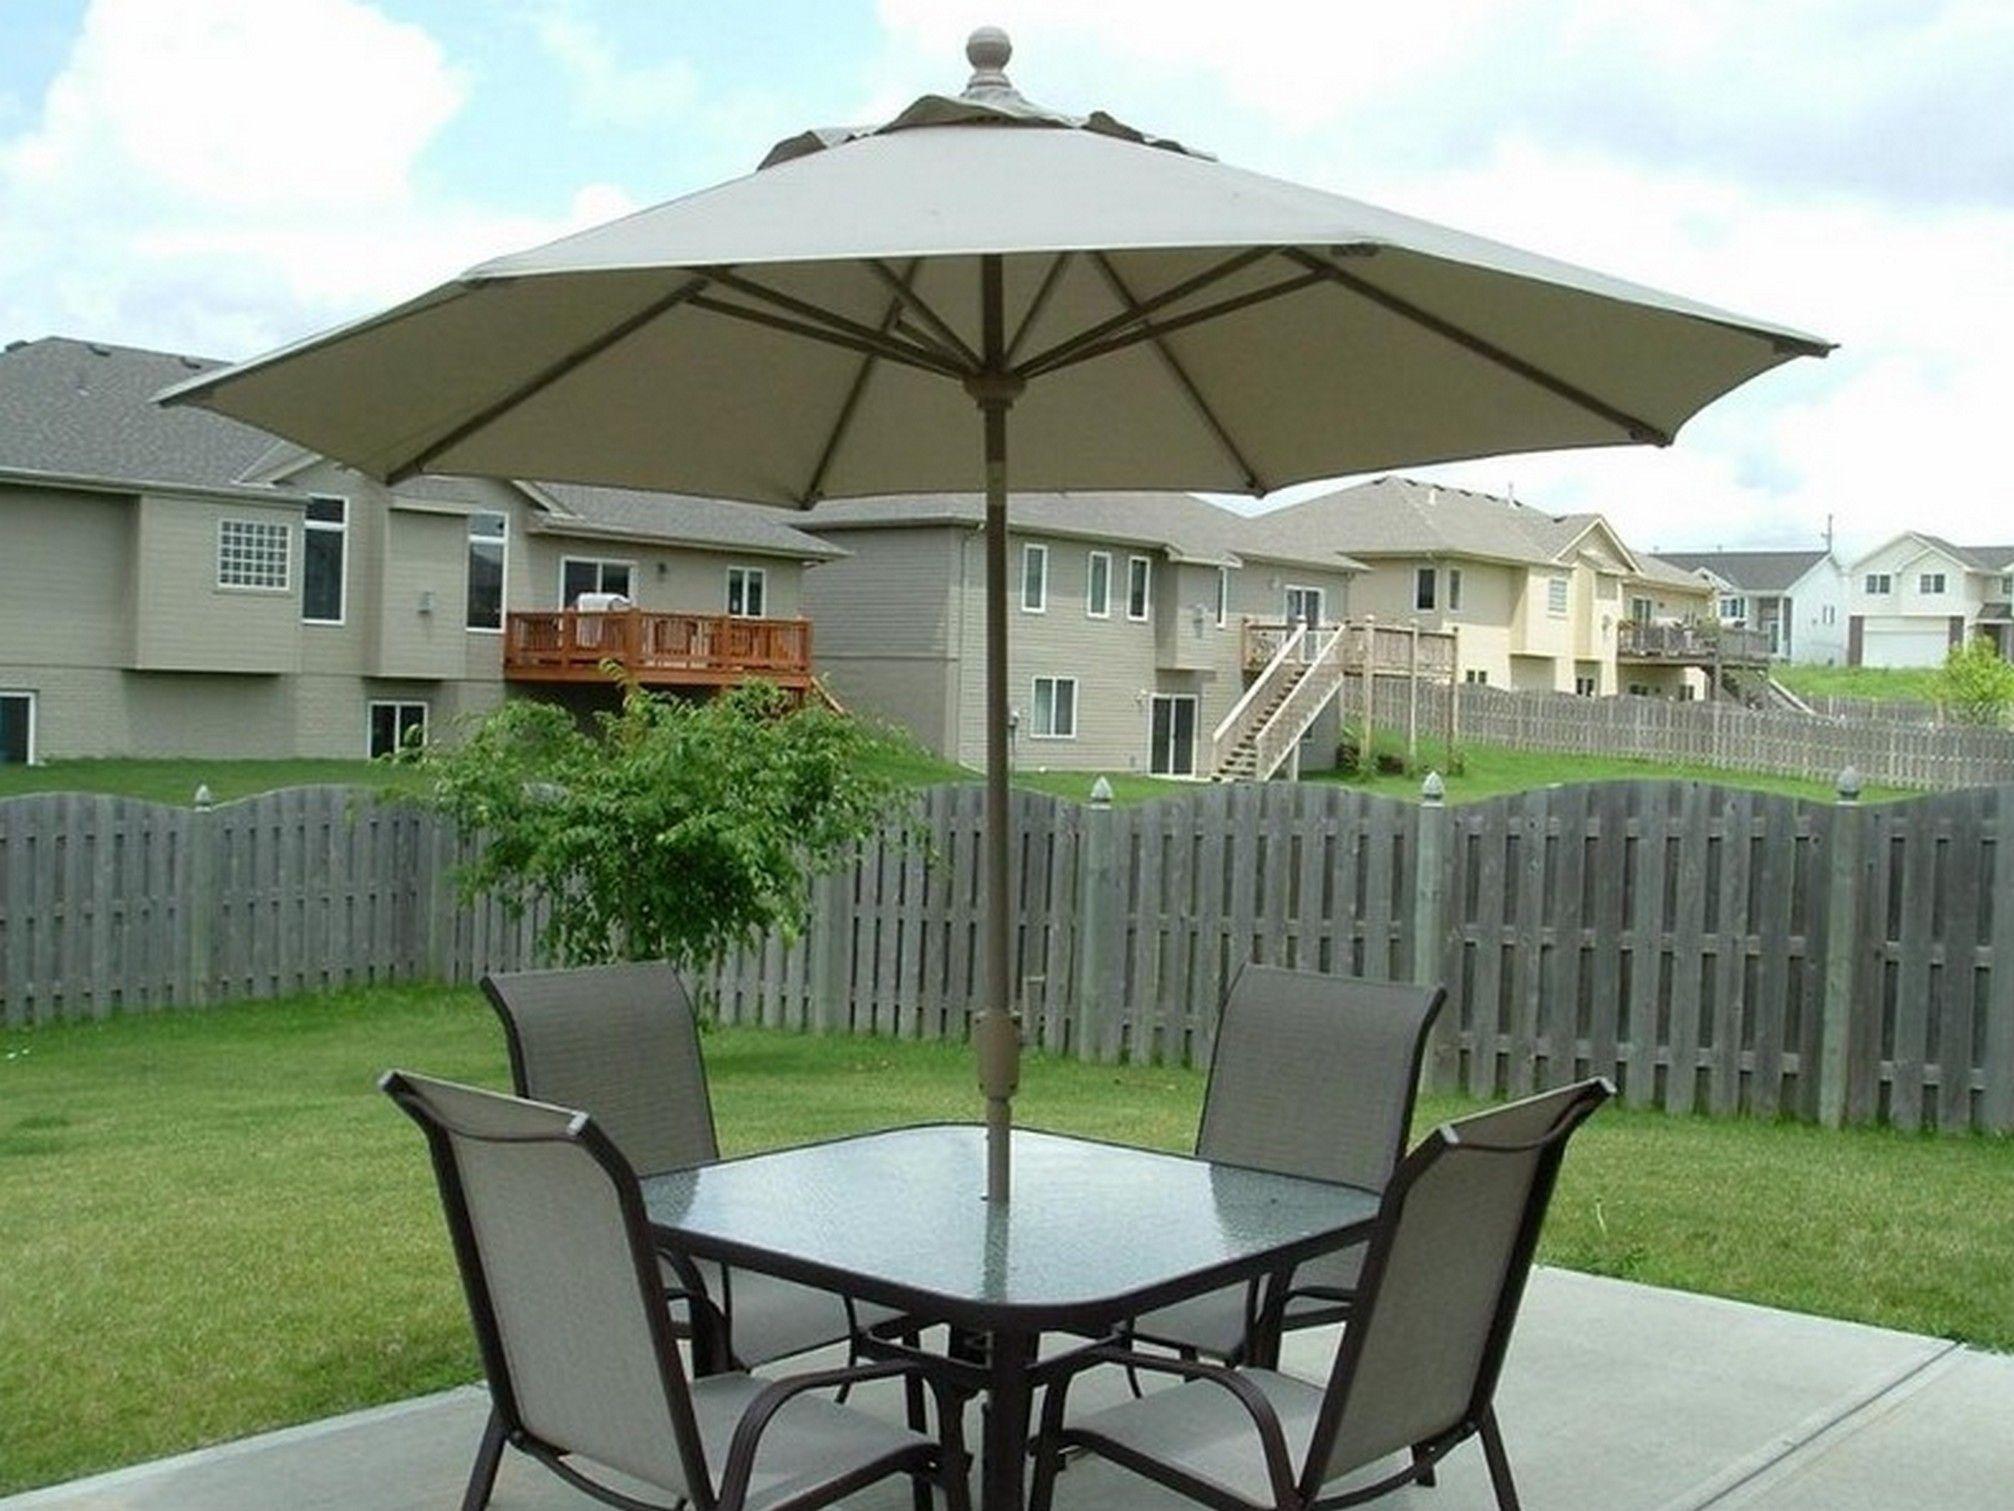 Patio Tables With Umbrella